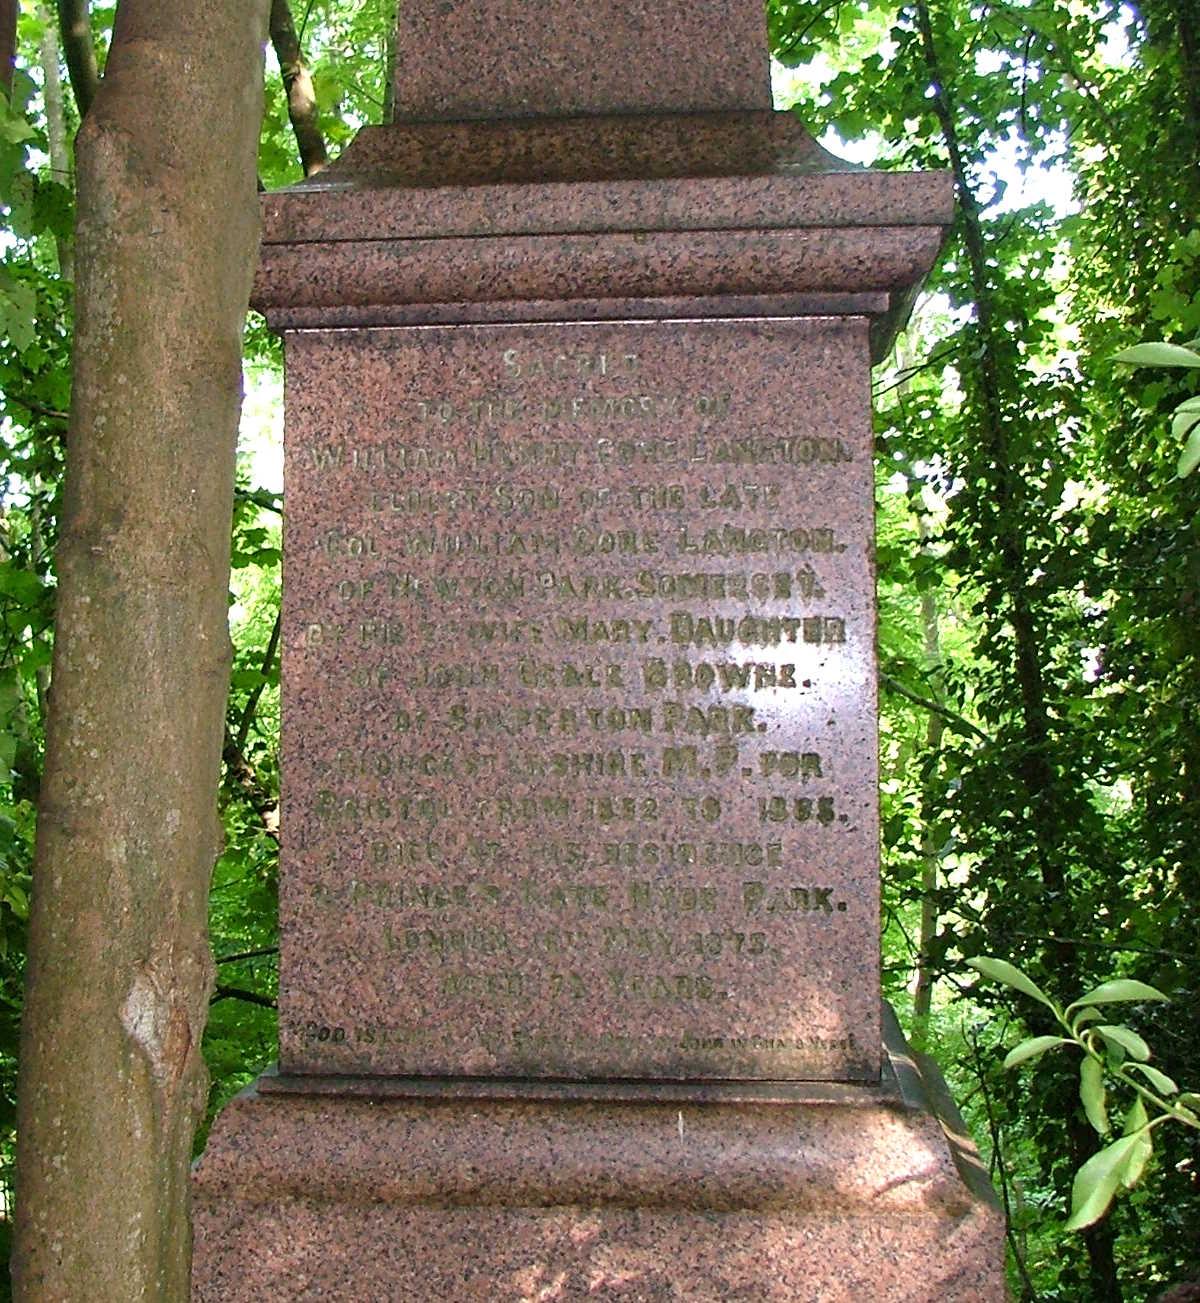 heritage-william-langton inscription